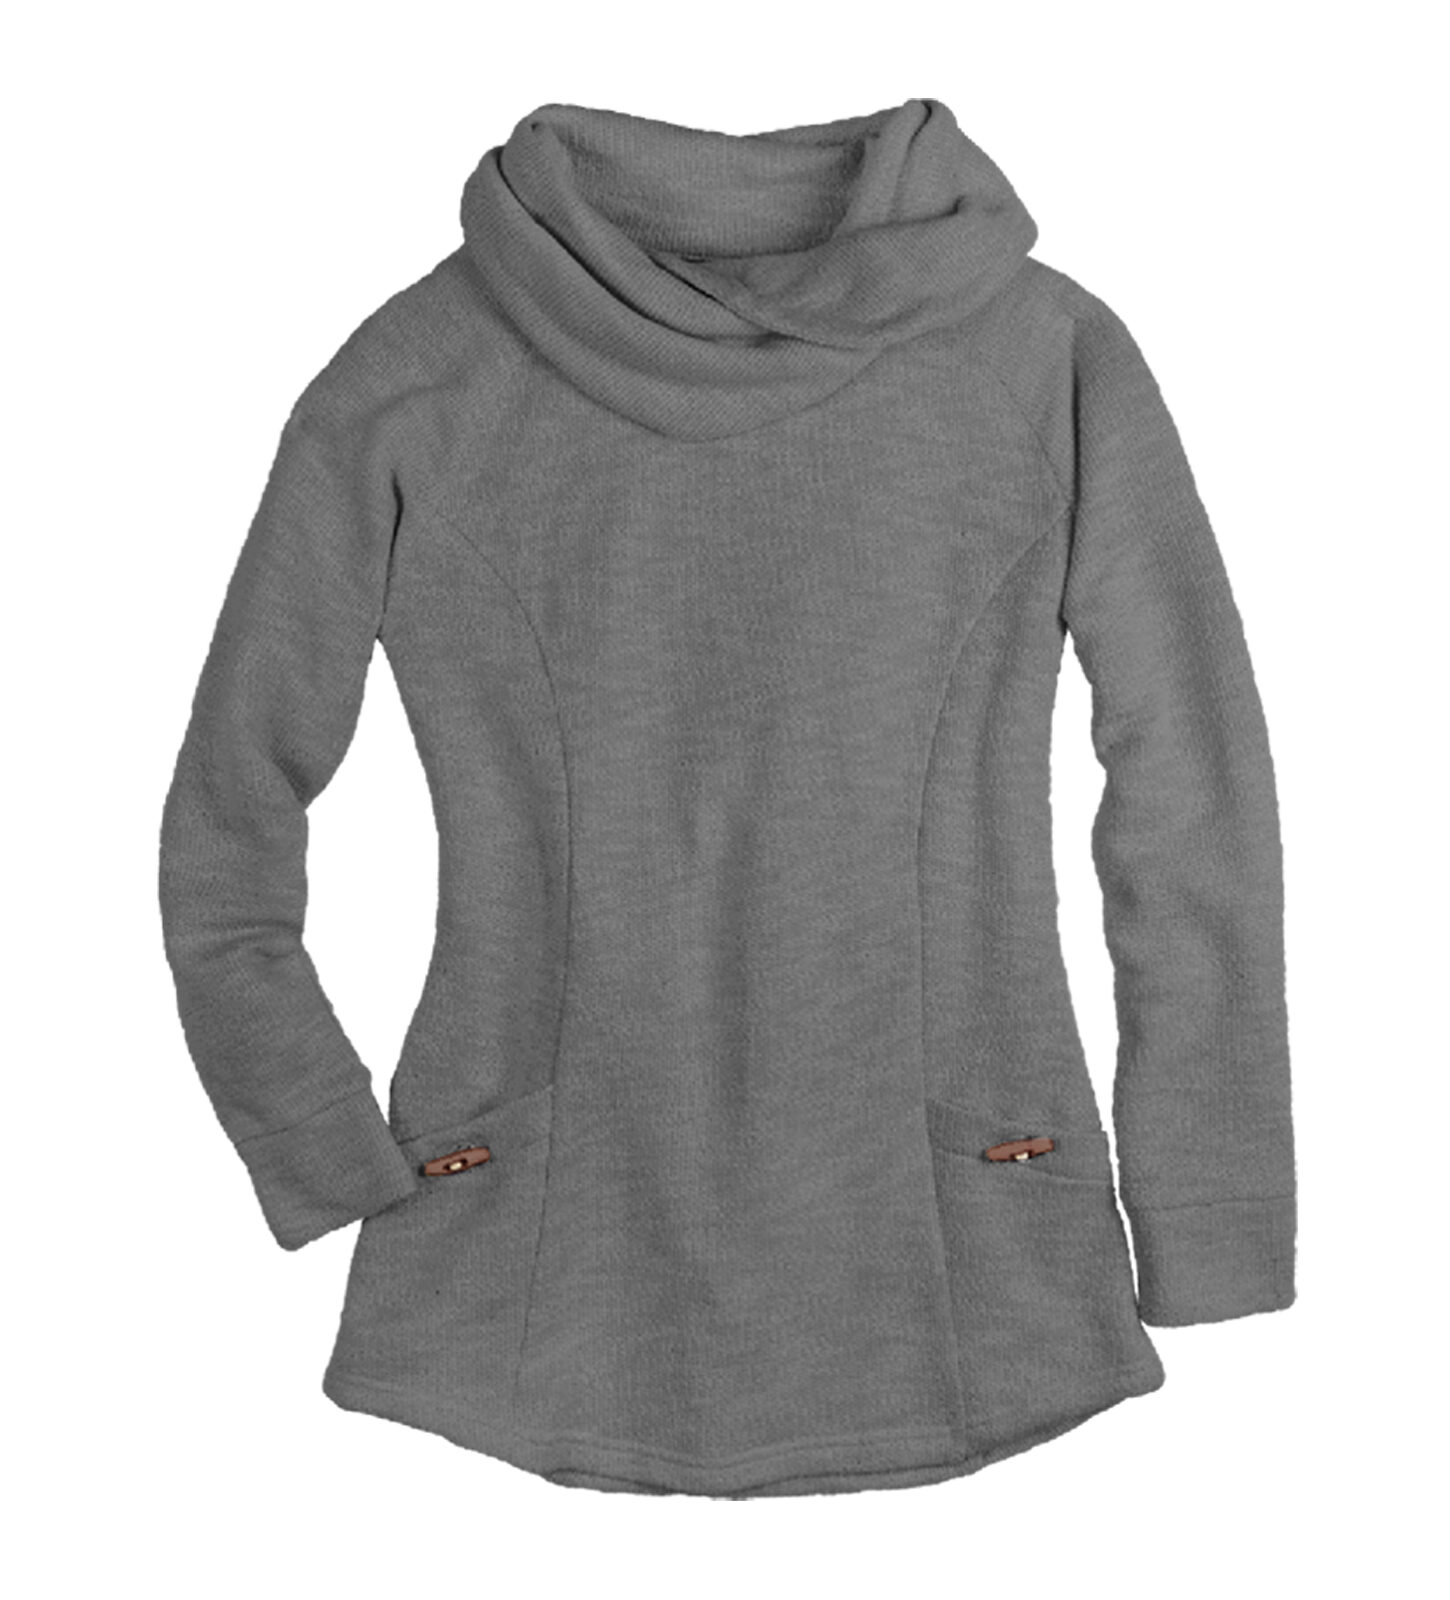 Storm Creek 2945 - Women's Pullovers The Dreamer